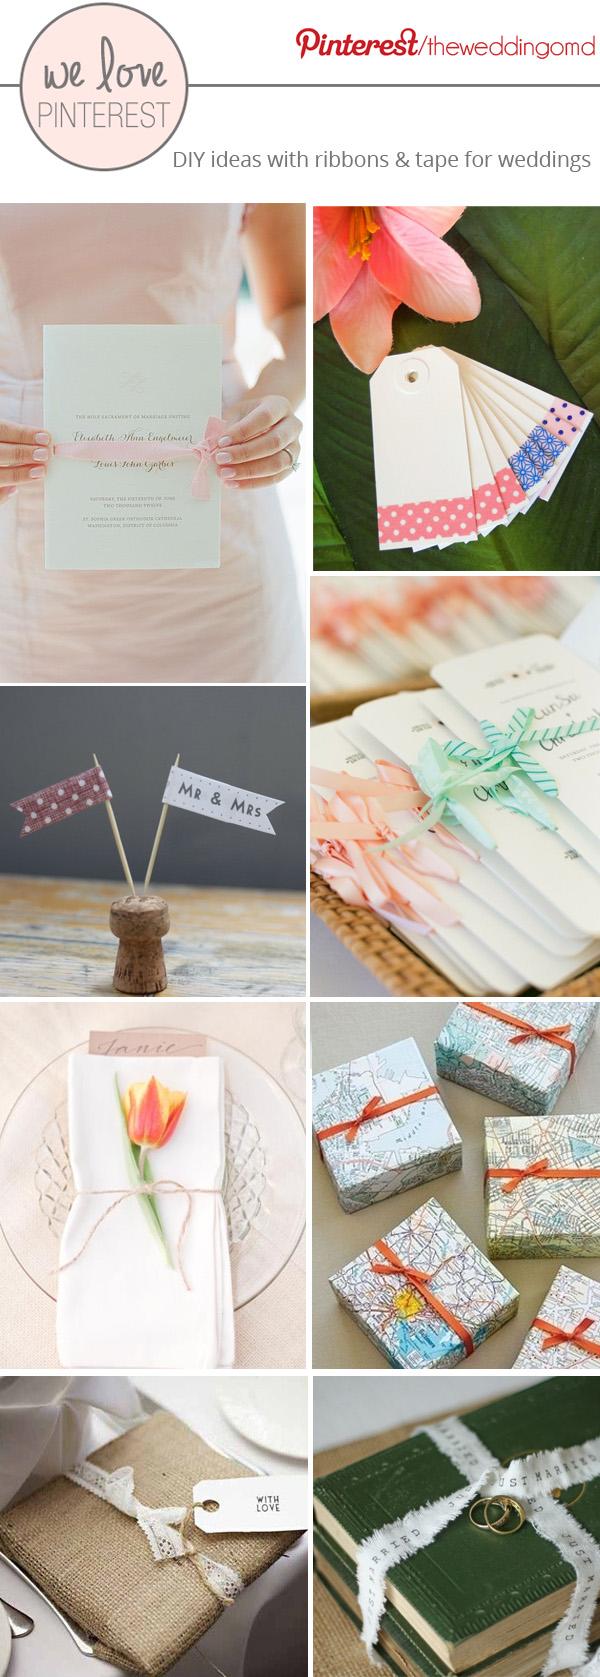 DIY ribbon wedding ideas - wedding invitations, napkins gift wrapping